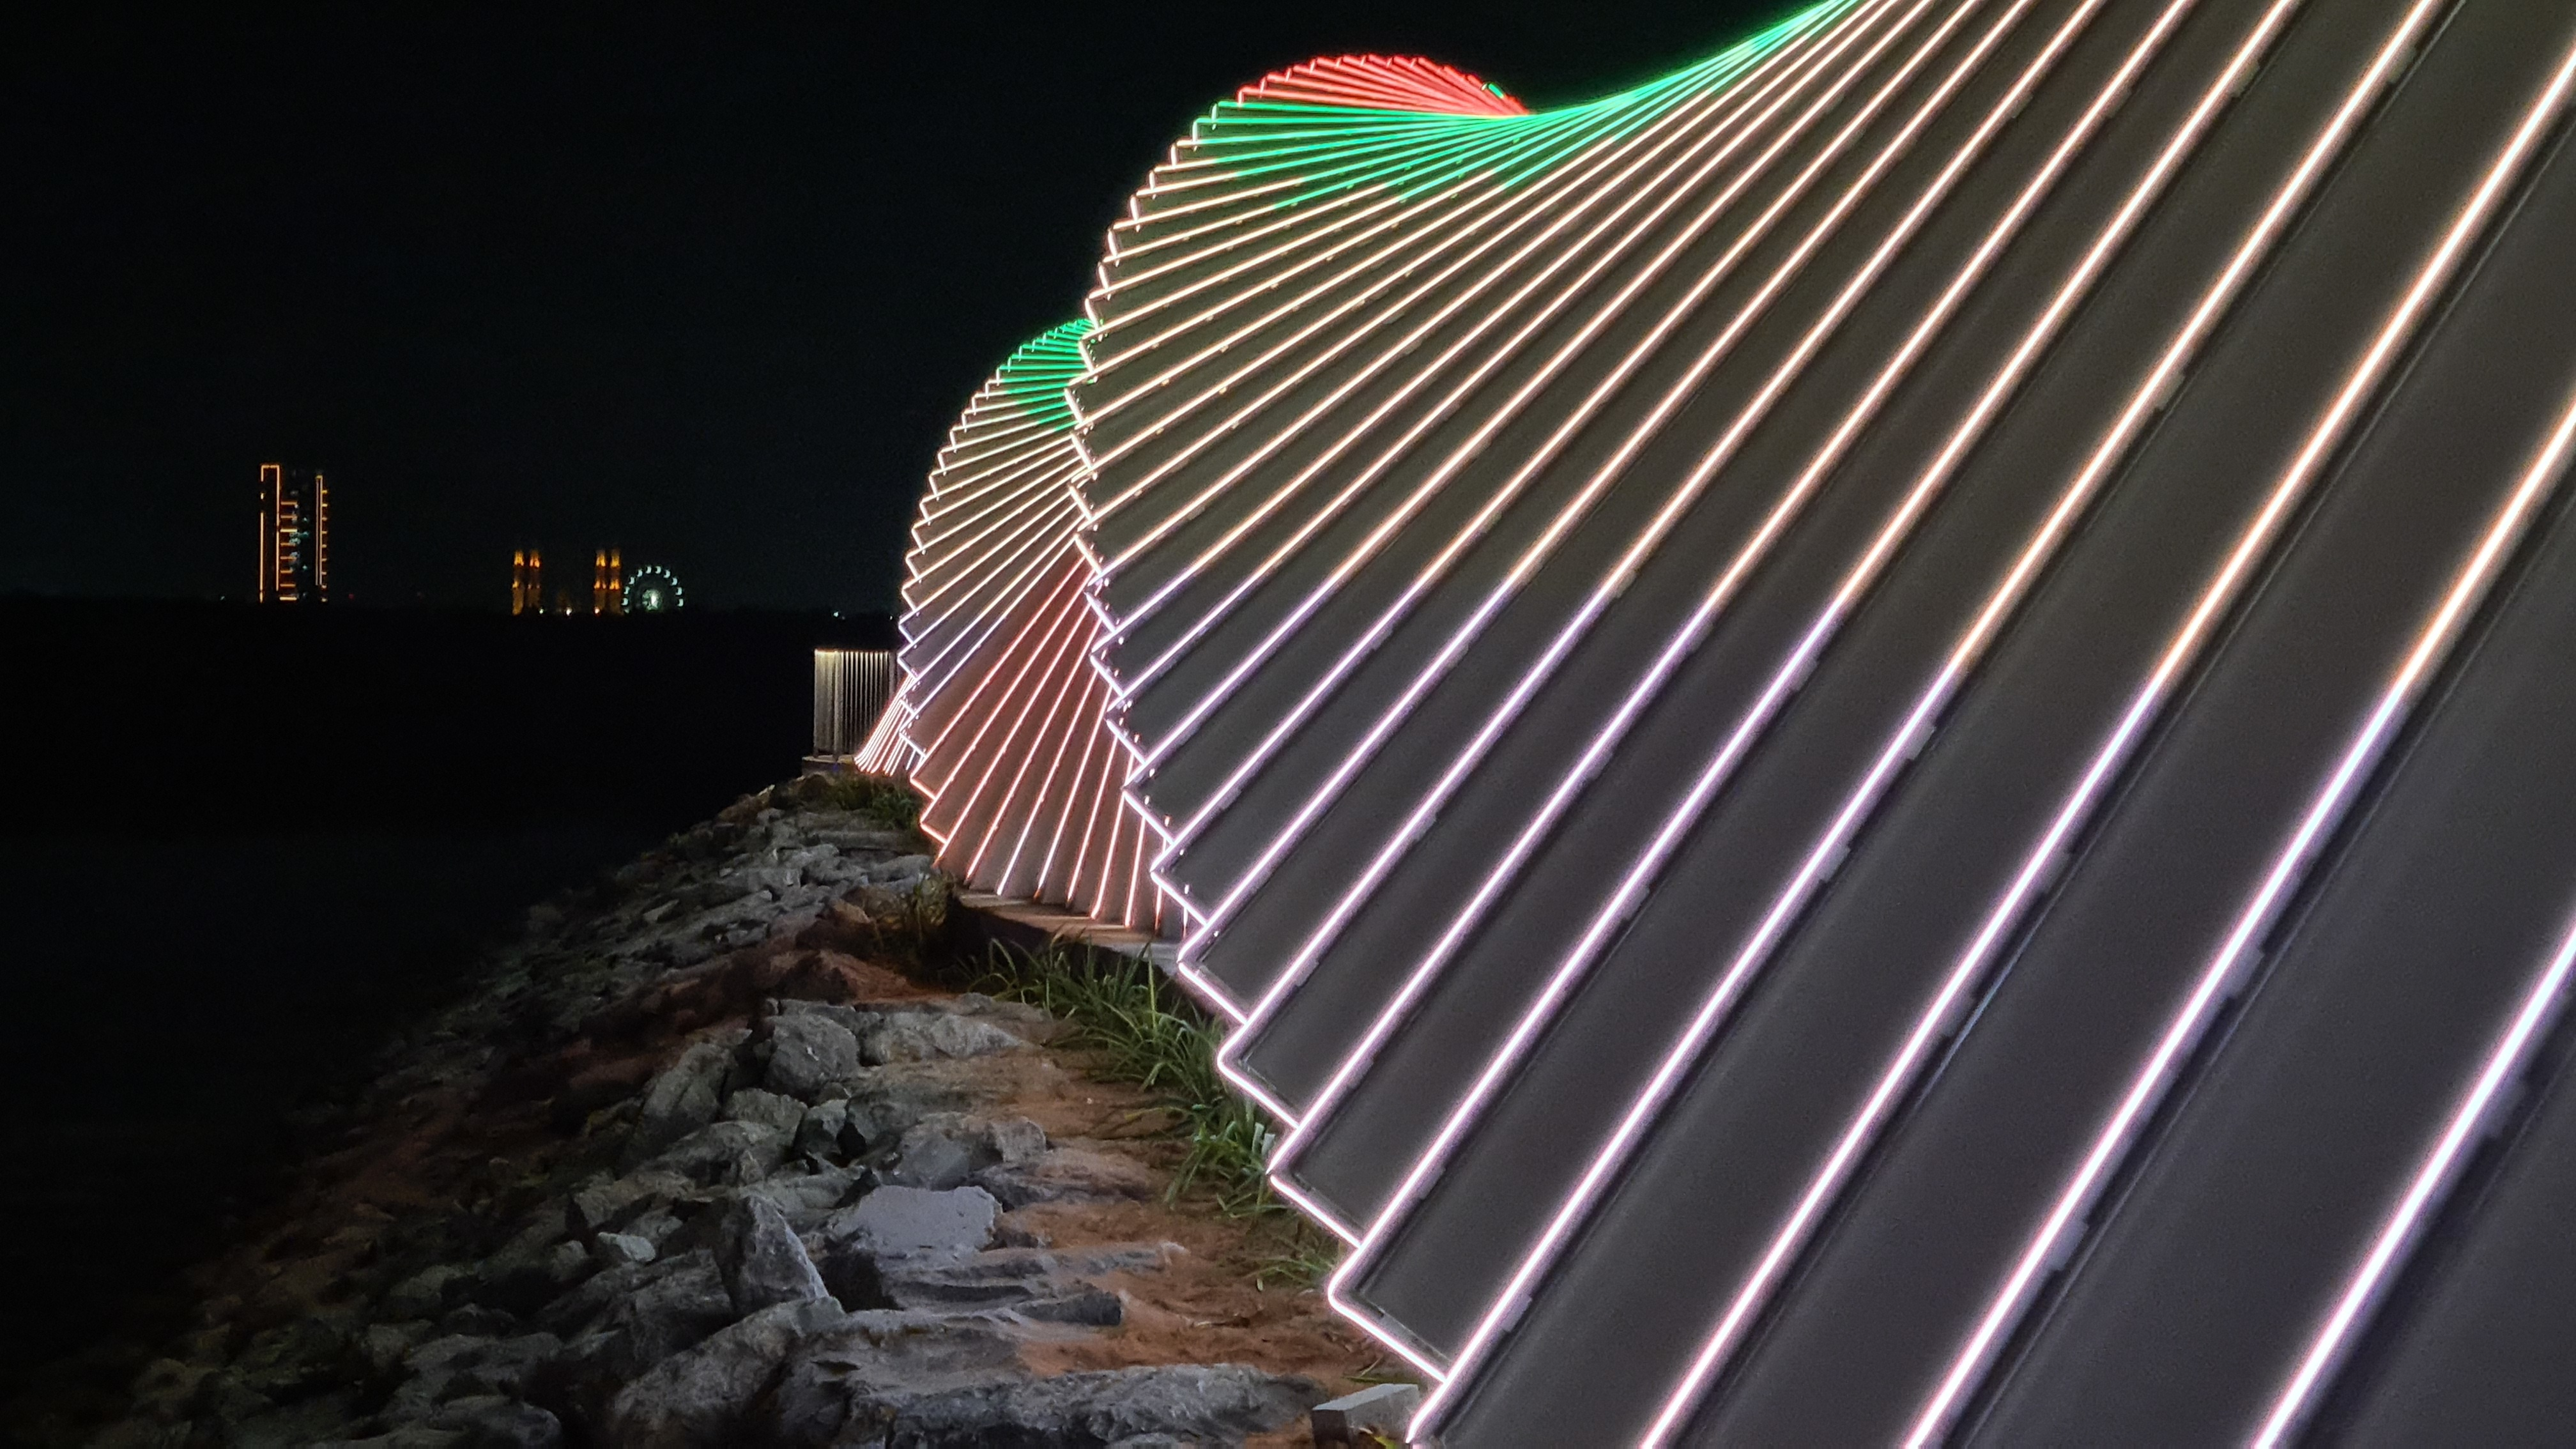 Geometric angles at the Manar Mall Walkway Bridge